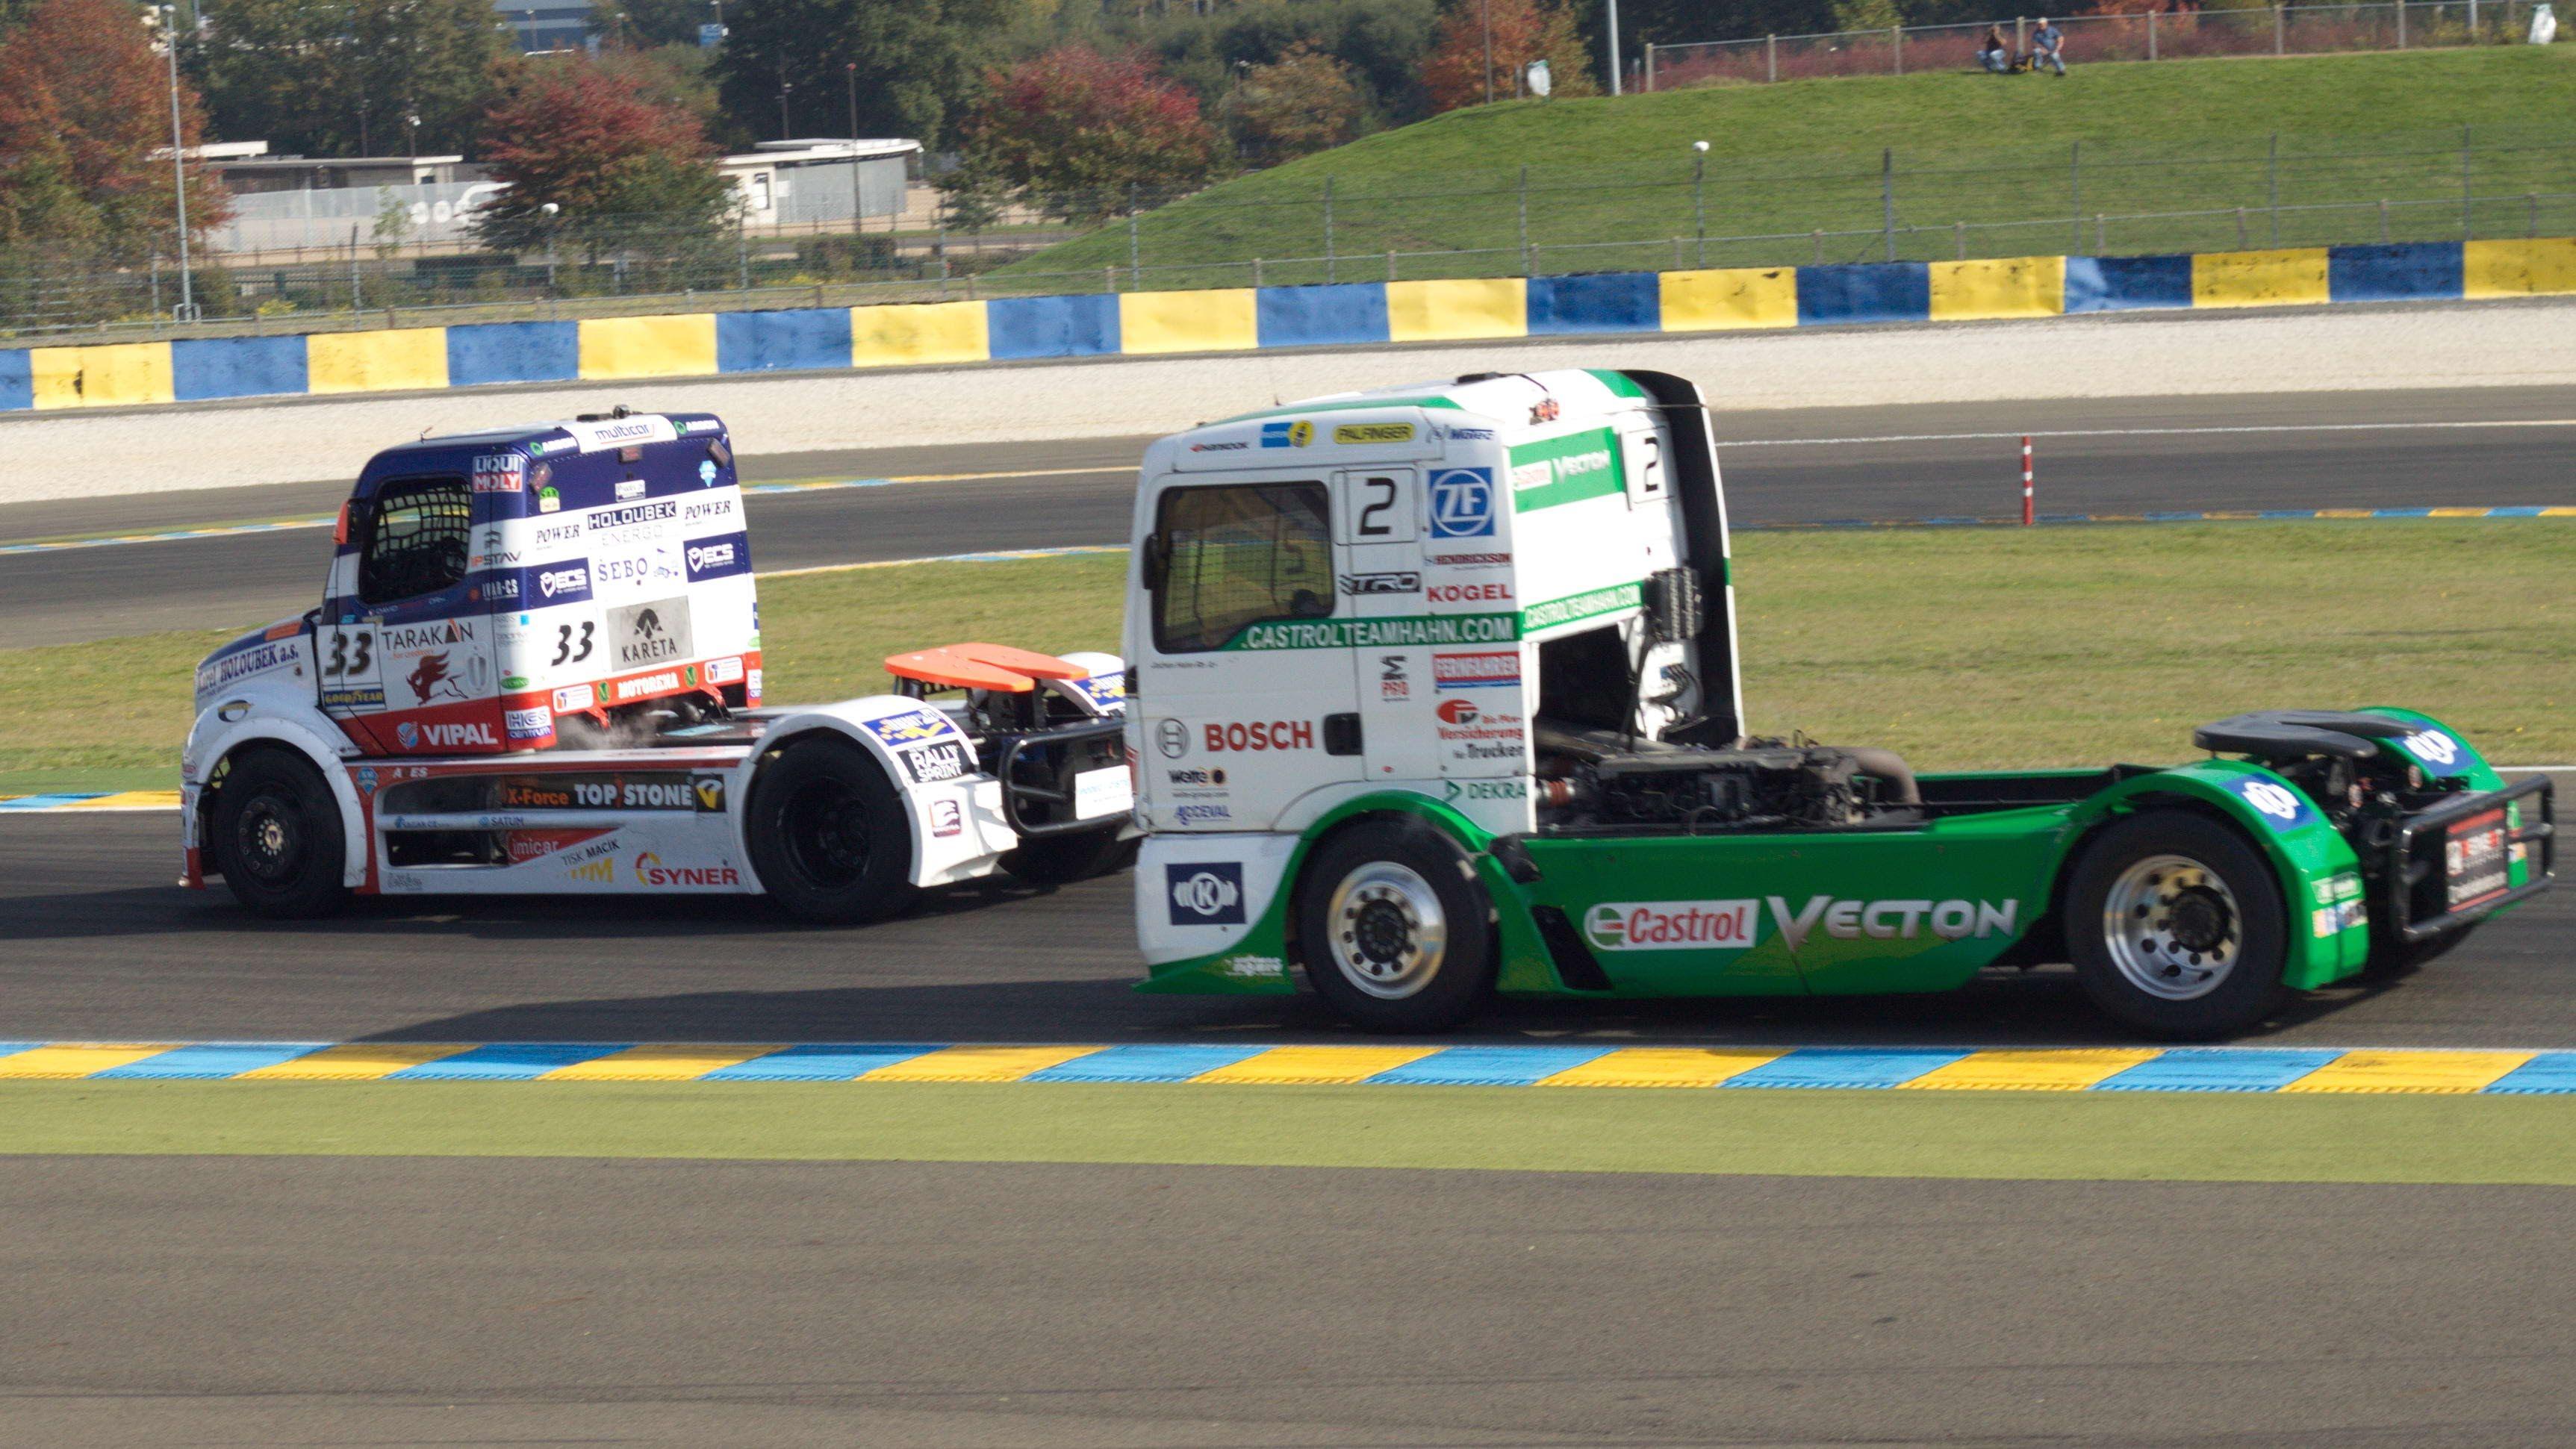 24 heures camions european truck racing championship fia etrc race 1 rh pinterest com